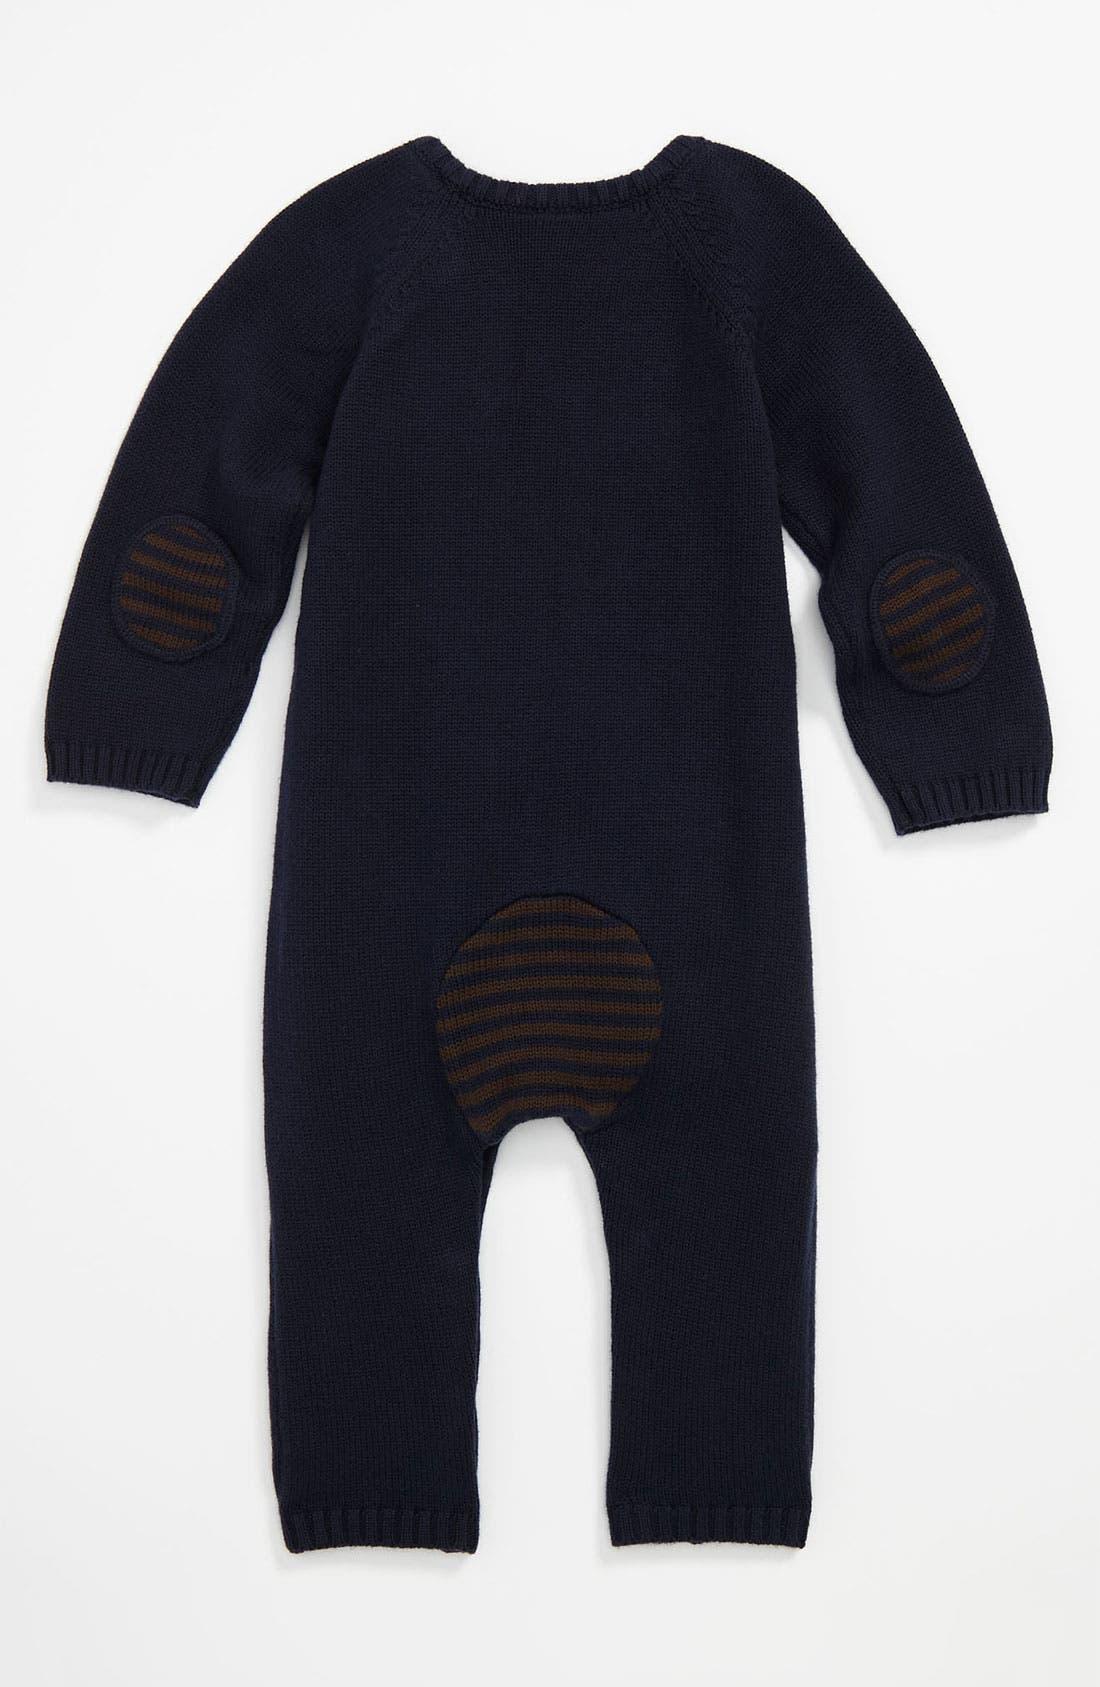 Alternate Image 2  - Nordstrom Baby Knit Romper (Infant)